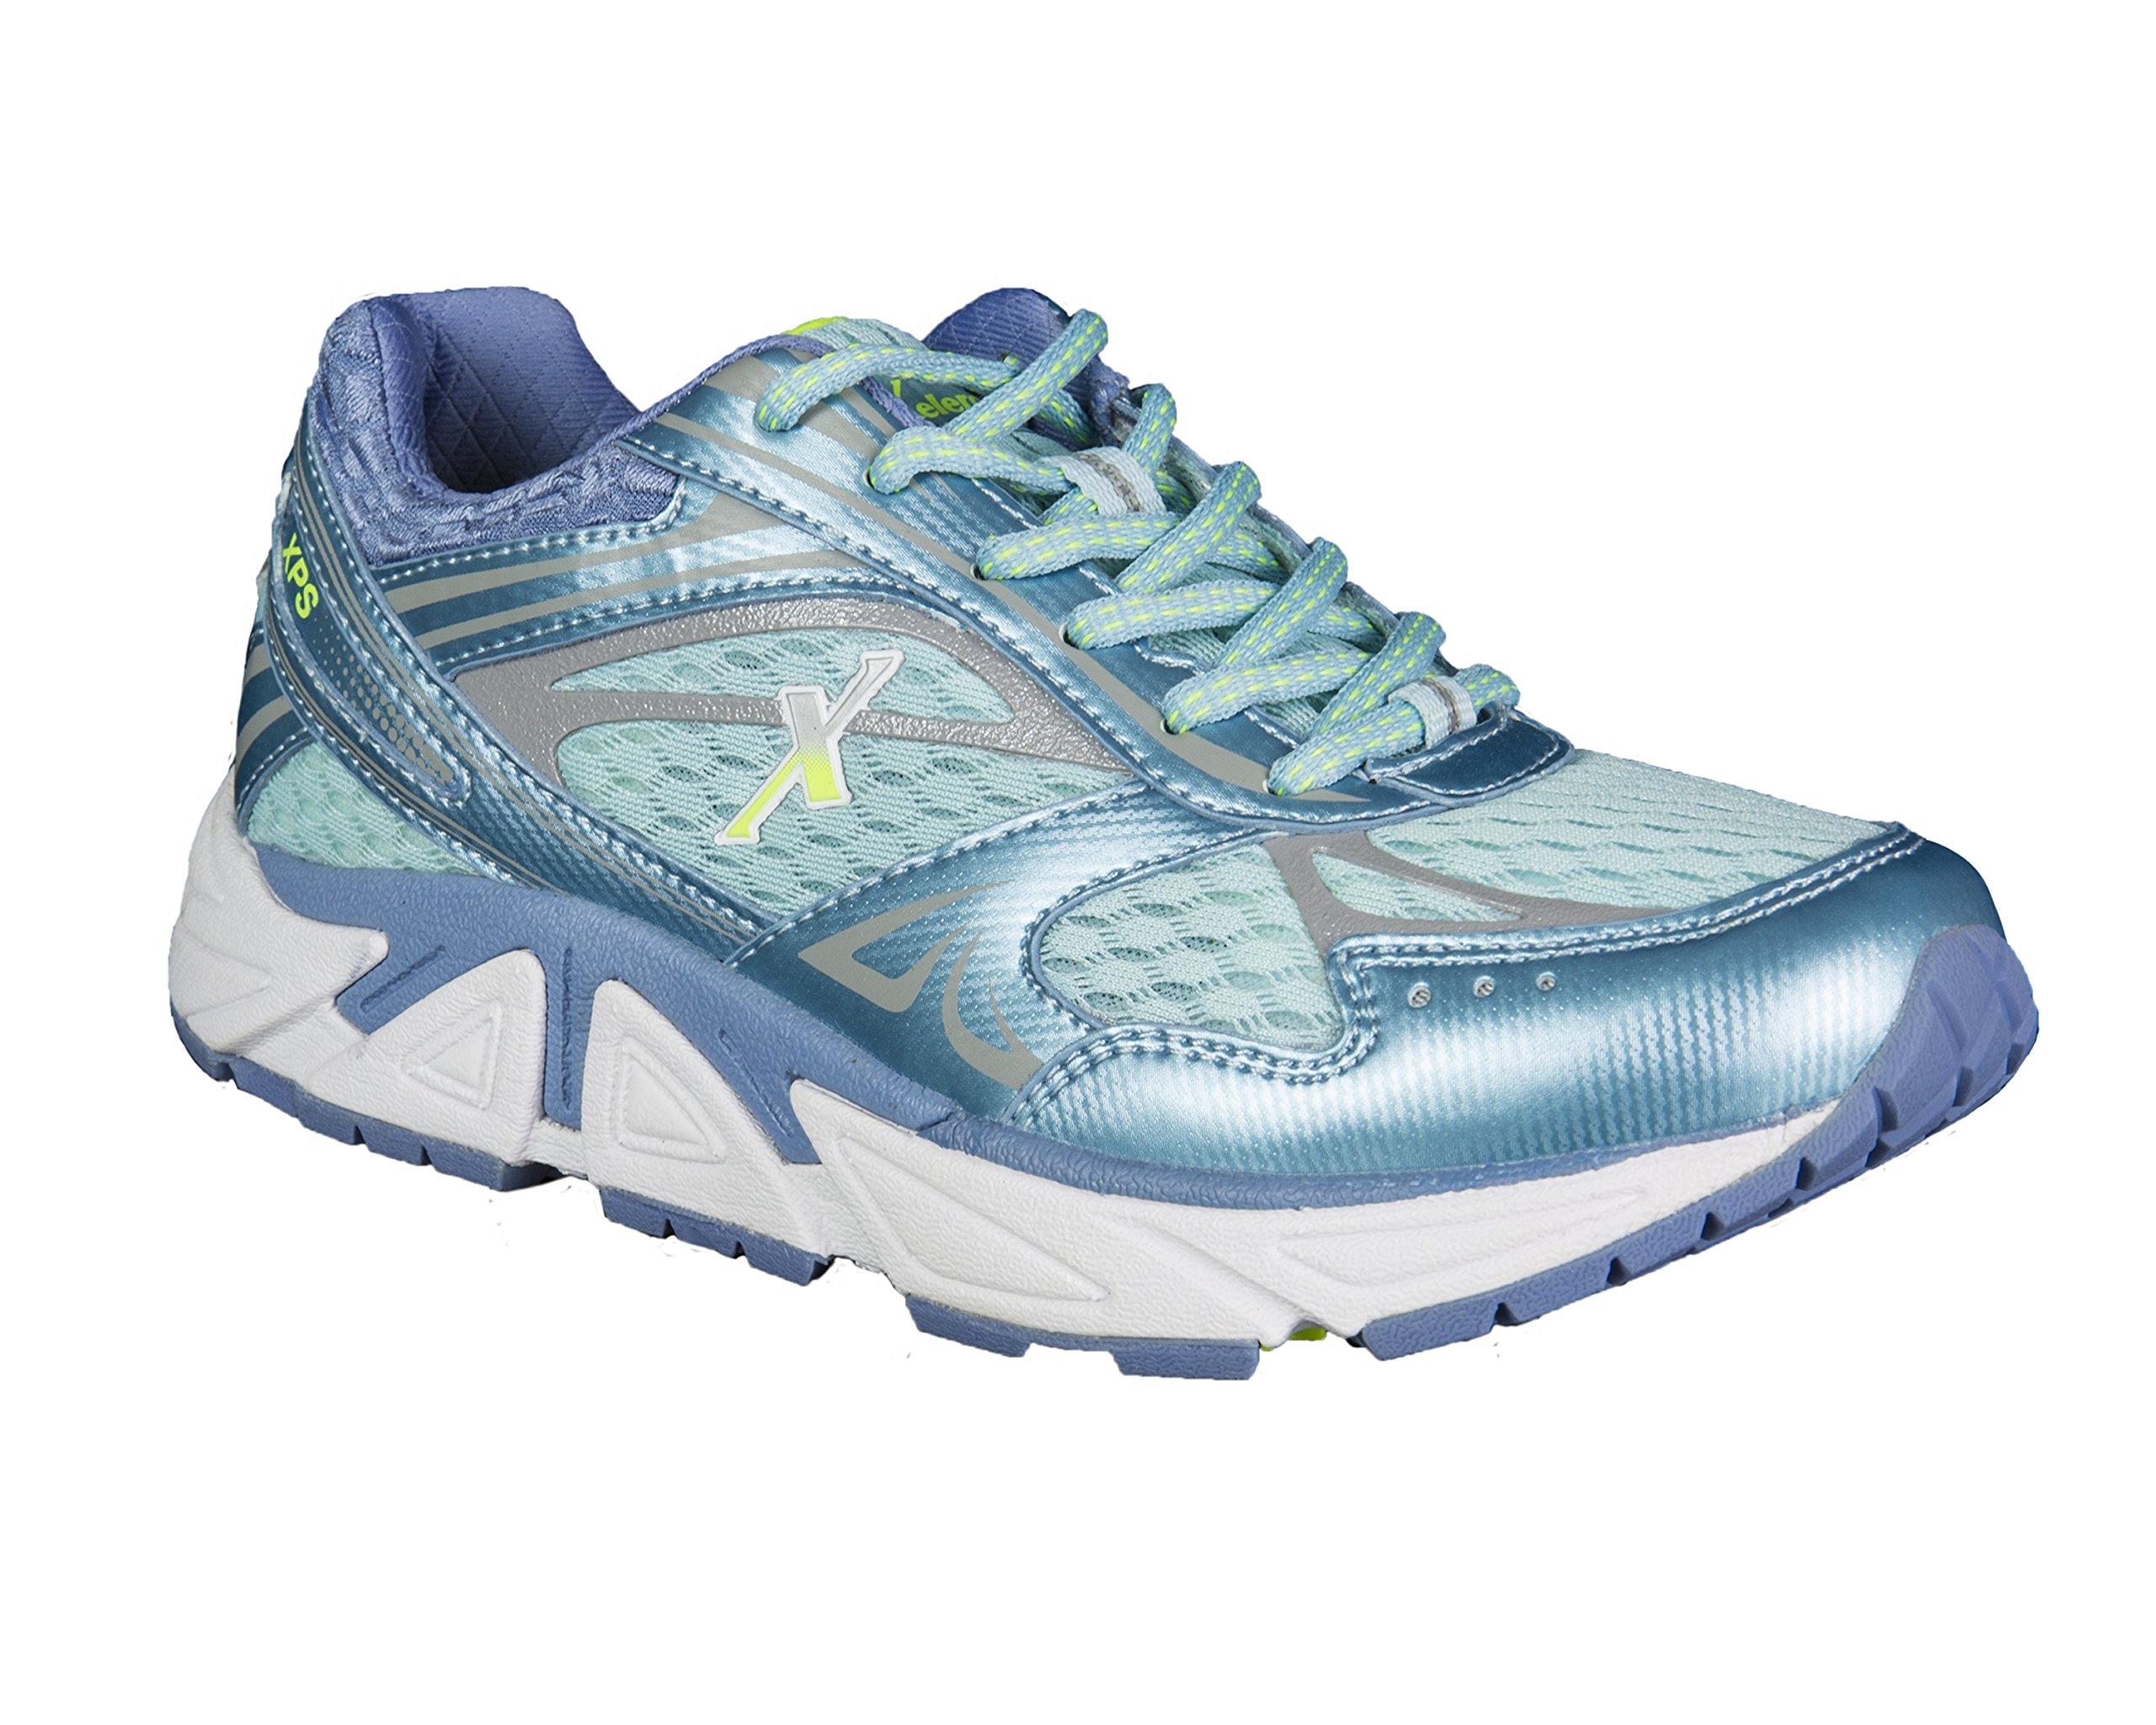 Xelero Genesis Women's Comfort Therapeutic Extra Depth Sneaker Shoe: Ocean/Lilac 12 Medium (B) Lace